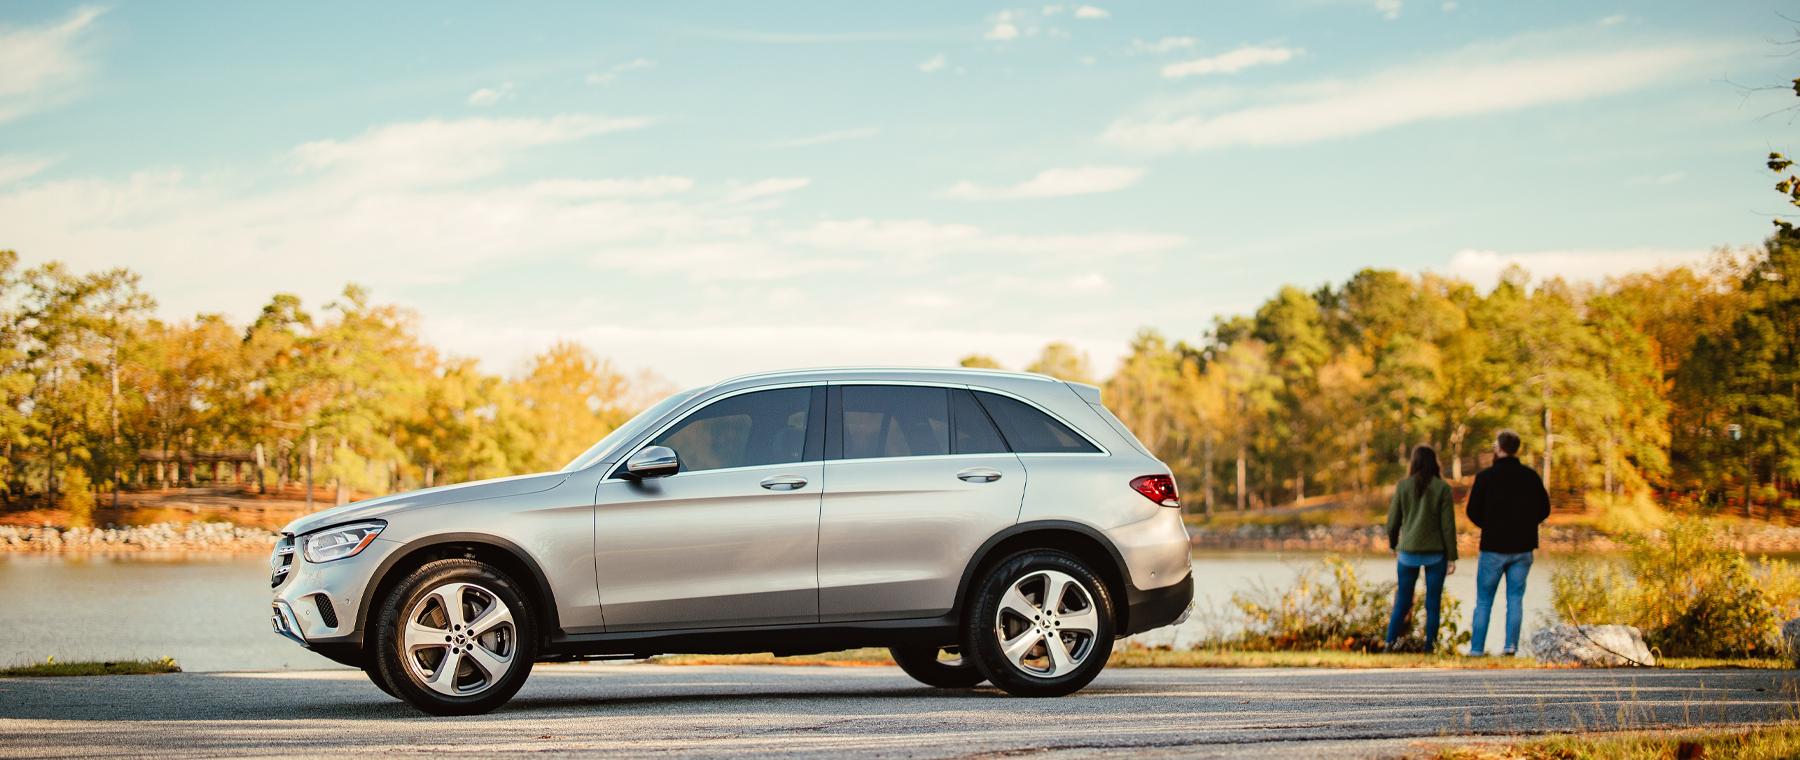 Certified Pre-Owned at Mercedes-Benz Burlington